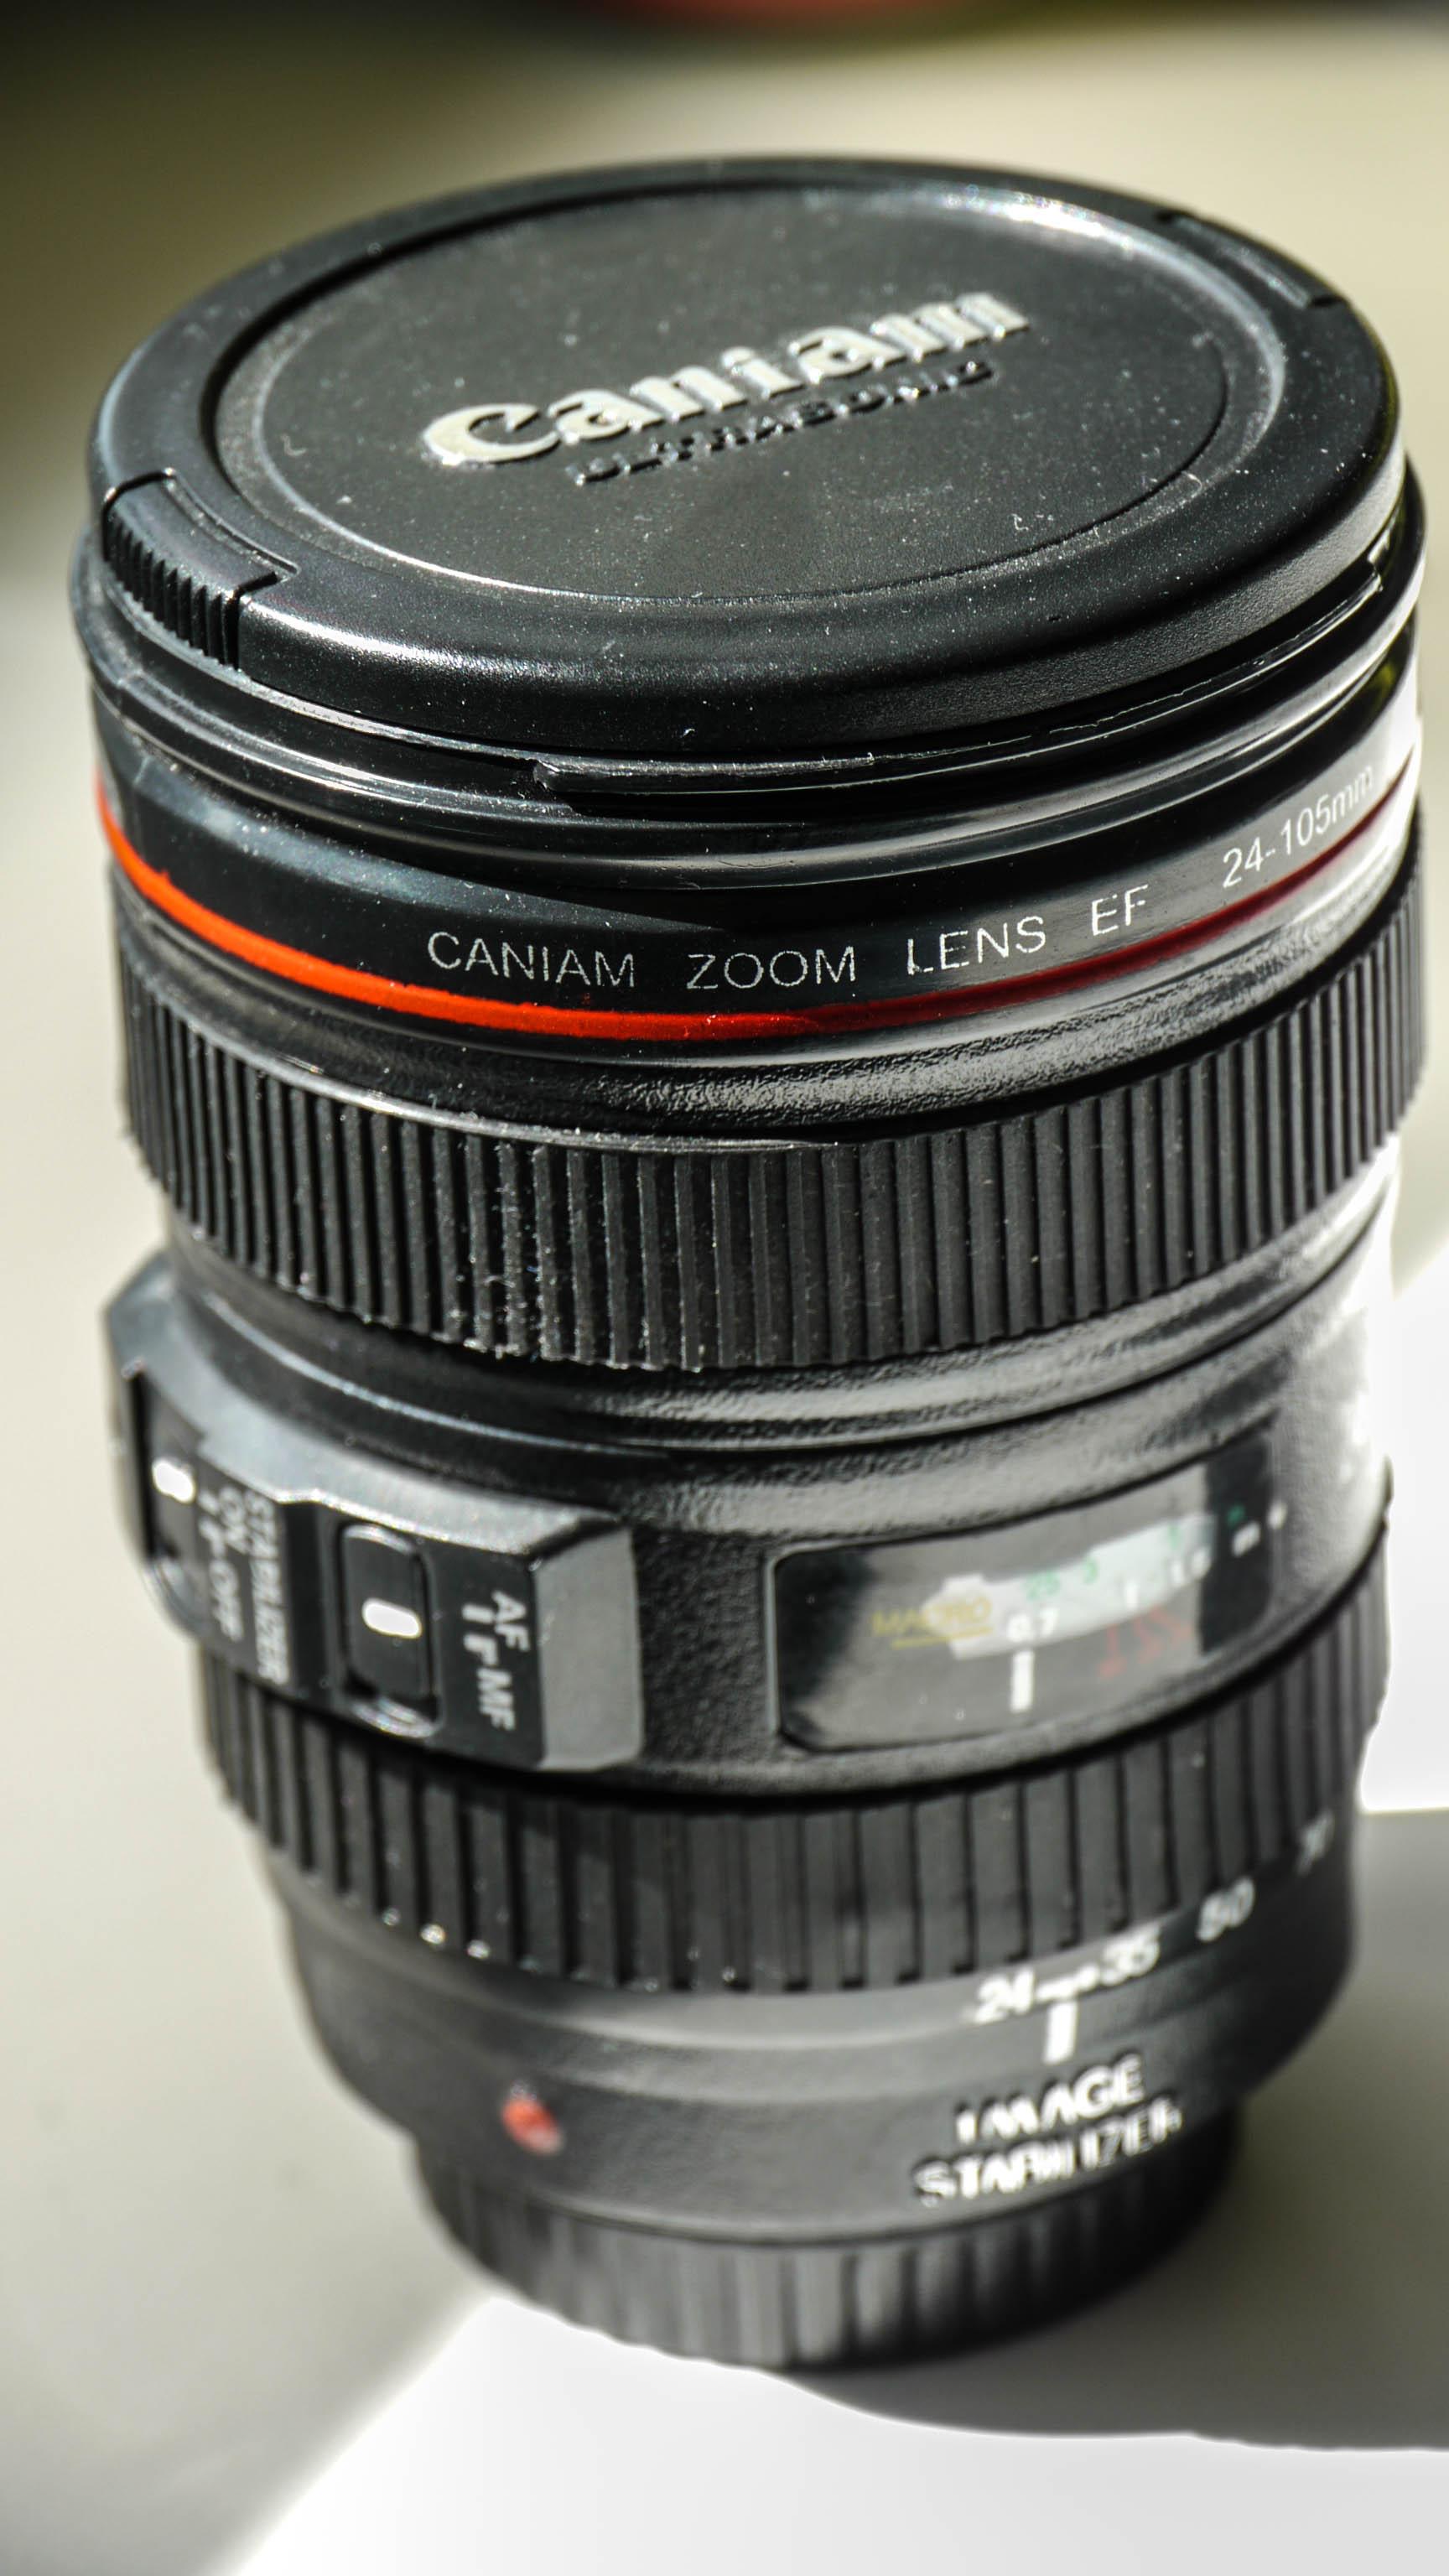 Caniam objectif mug canon lens 2 blog for Canon photo lens mug